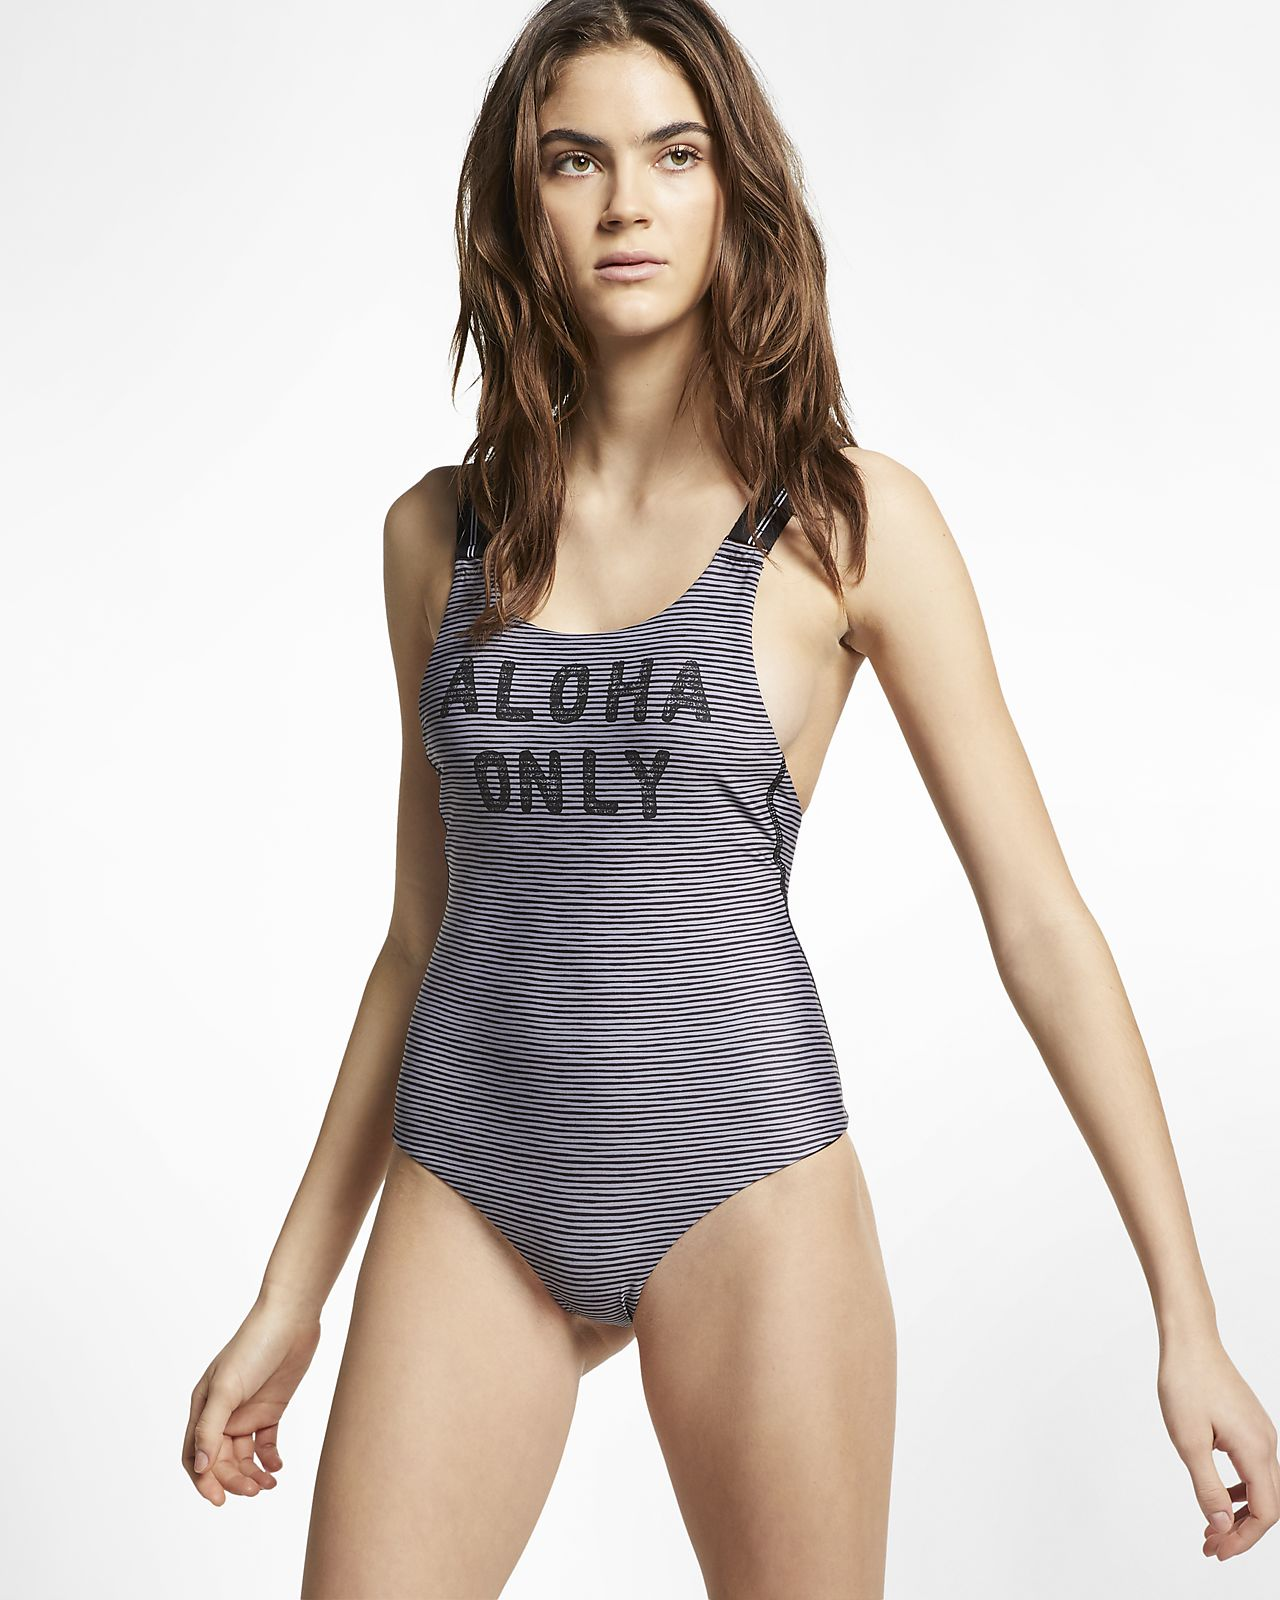 3eee63eaa98 Hurley Quick Dry Aloha Only Women's Bodysuit. Nike.com AE